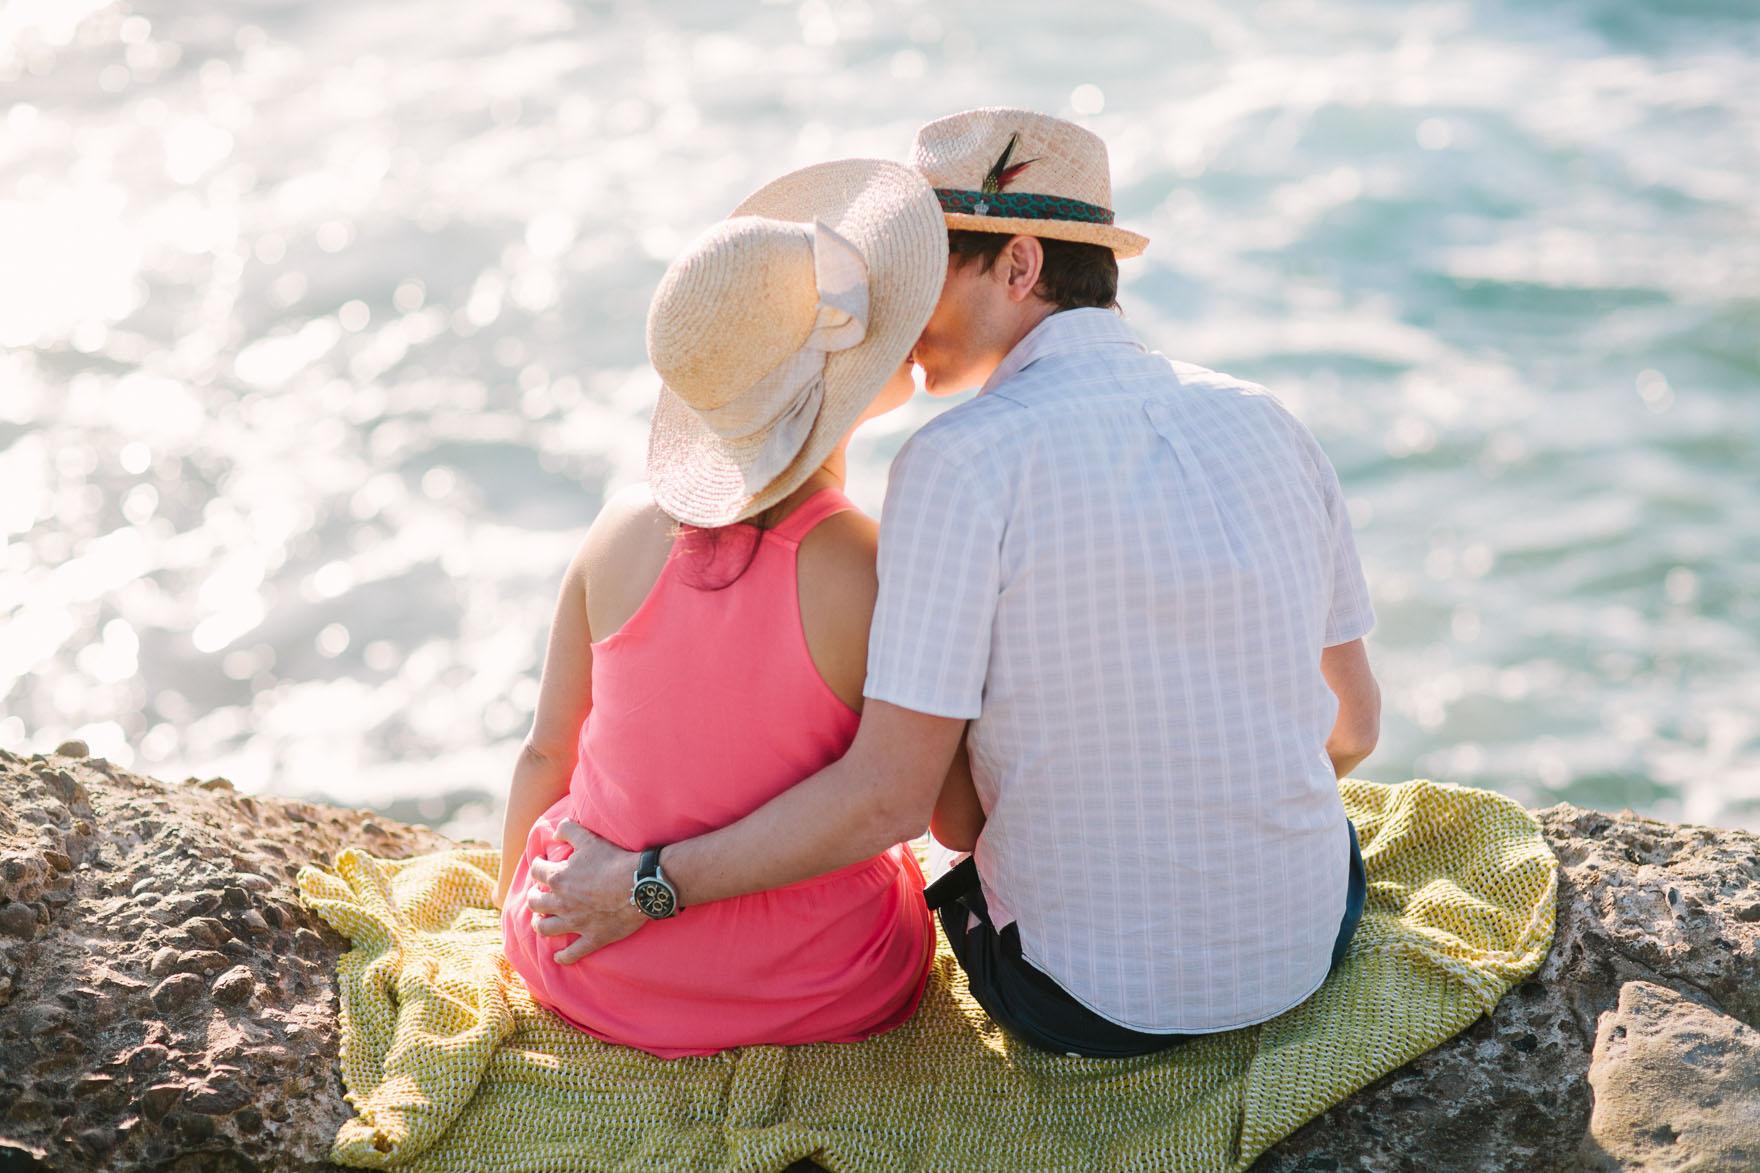 Shoreline La Jolla Snuggling – Photo by Let's Frolic Together